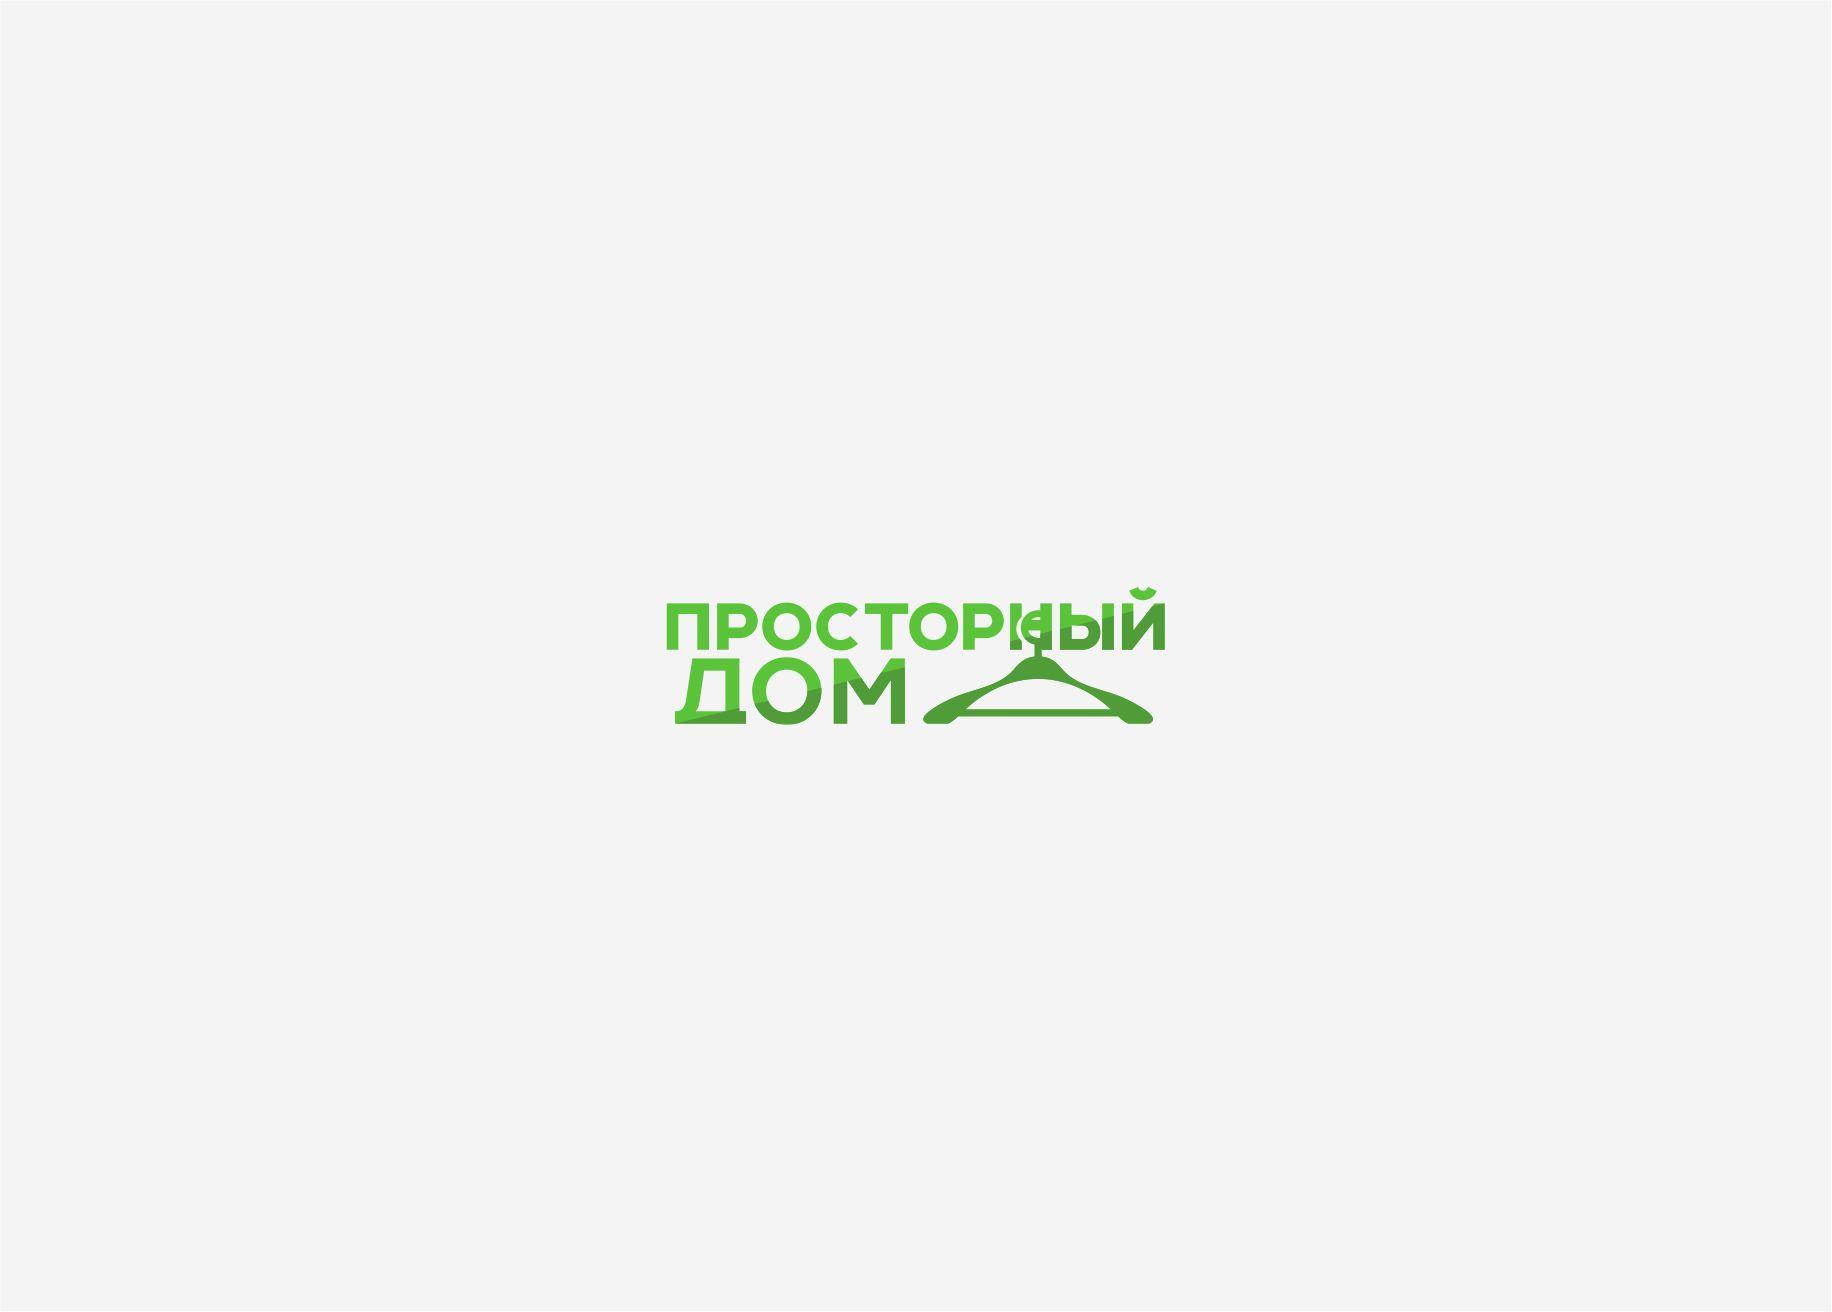 Логотип и фирменный стиль для компании по шкафам-купе фото f_3545b6b70c4579f6.jpg